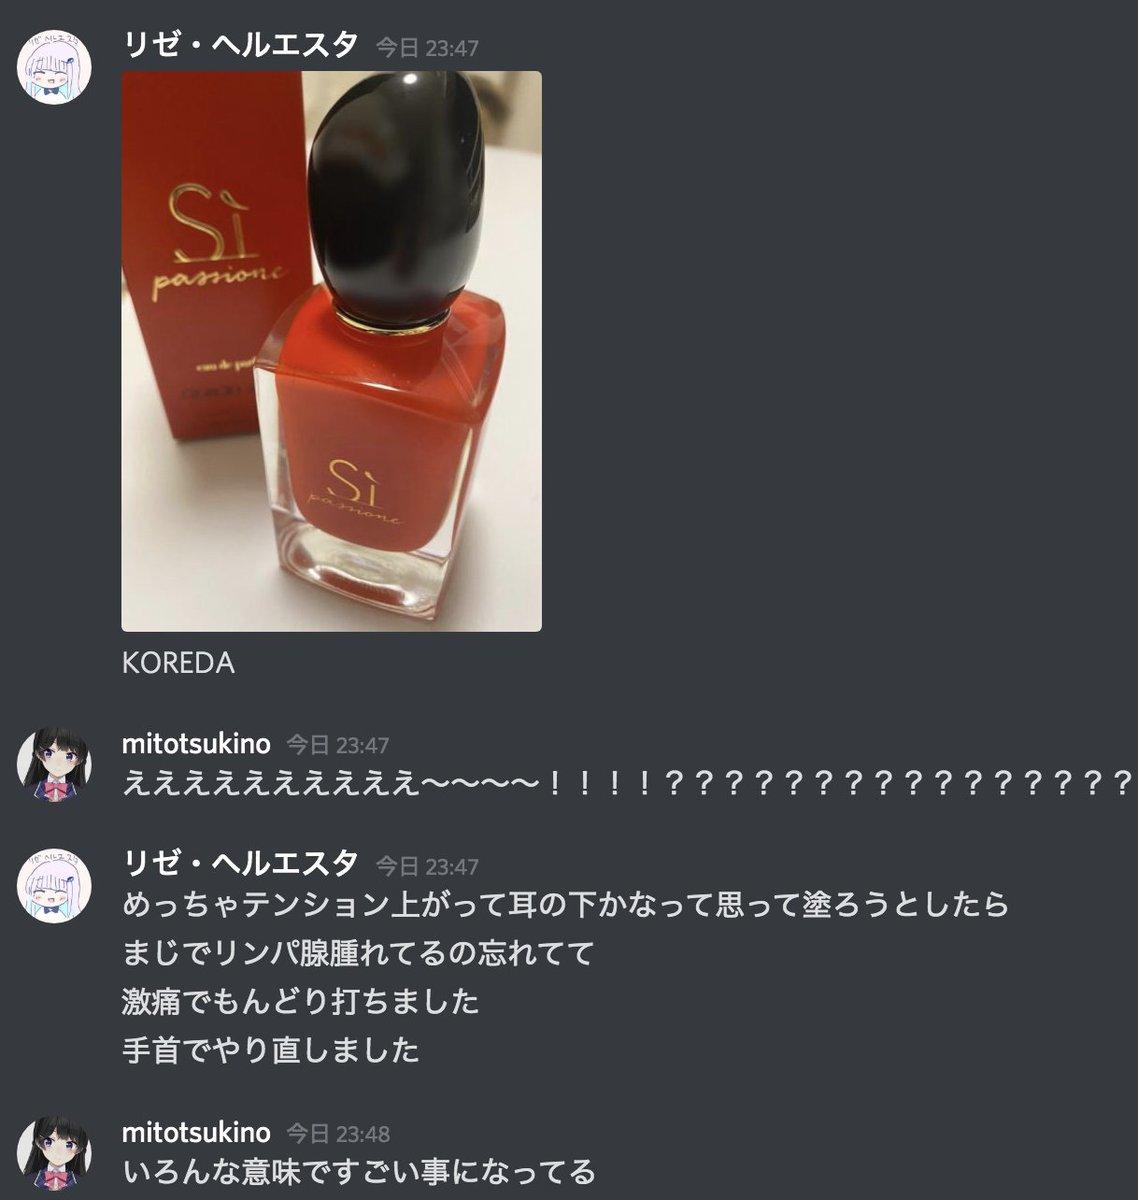 RT @MitoTsukino: 【朗報】シィパシオーネ、ゼの体臭も兼任担当する https://t.co/Pm4wCegesX